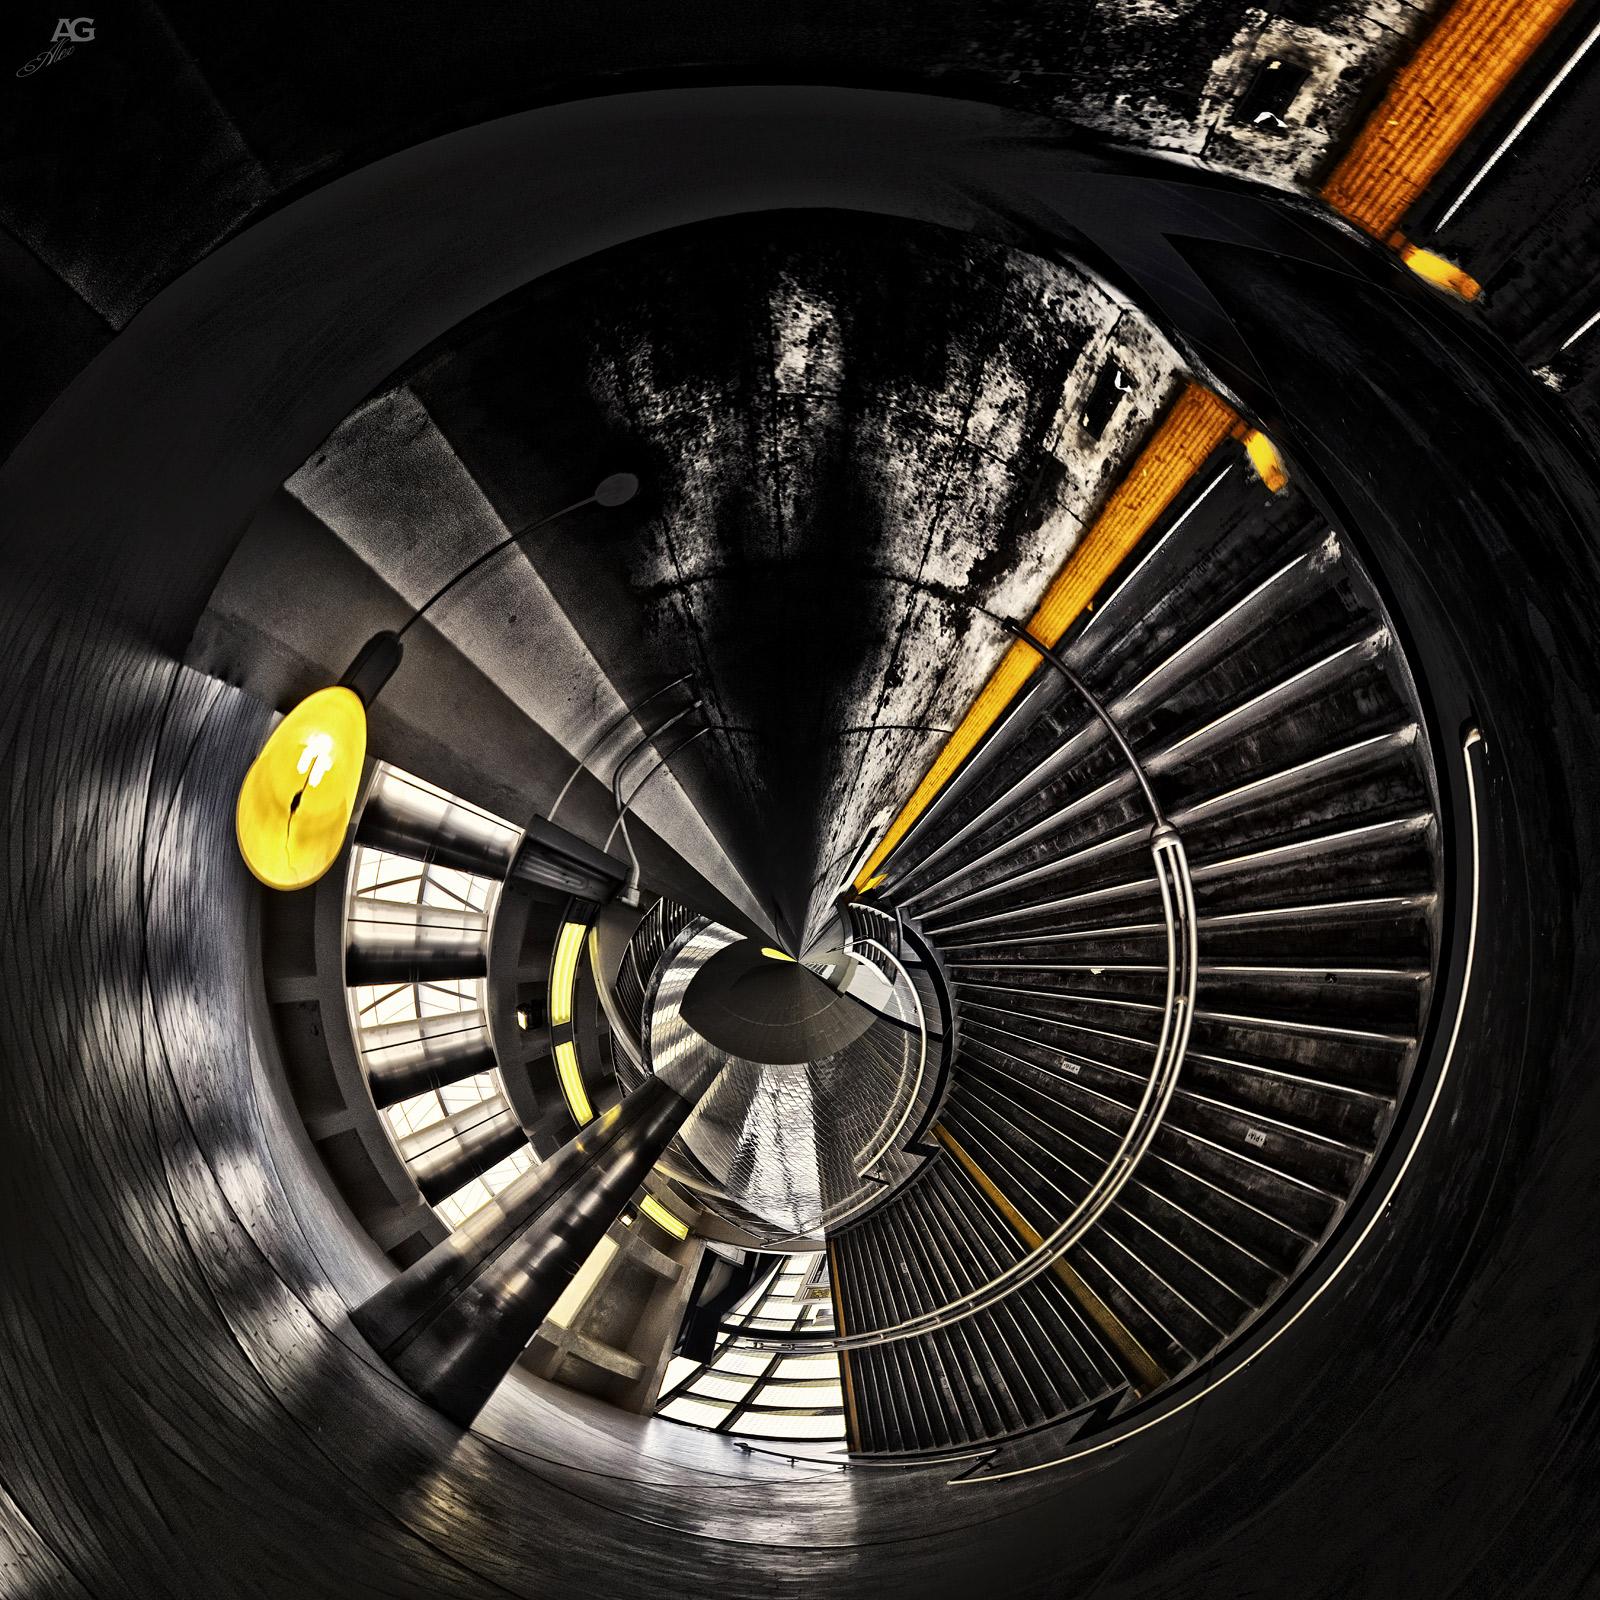 StairsOnTheSubwayTrainNeckRoadStationVertical_sigma_POLAR_1600---Copy